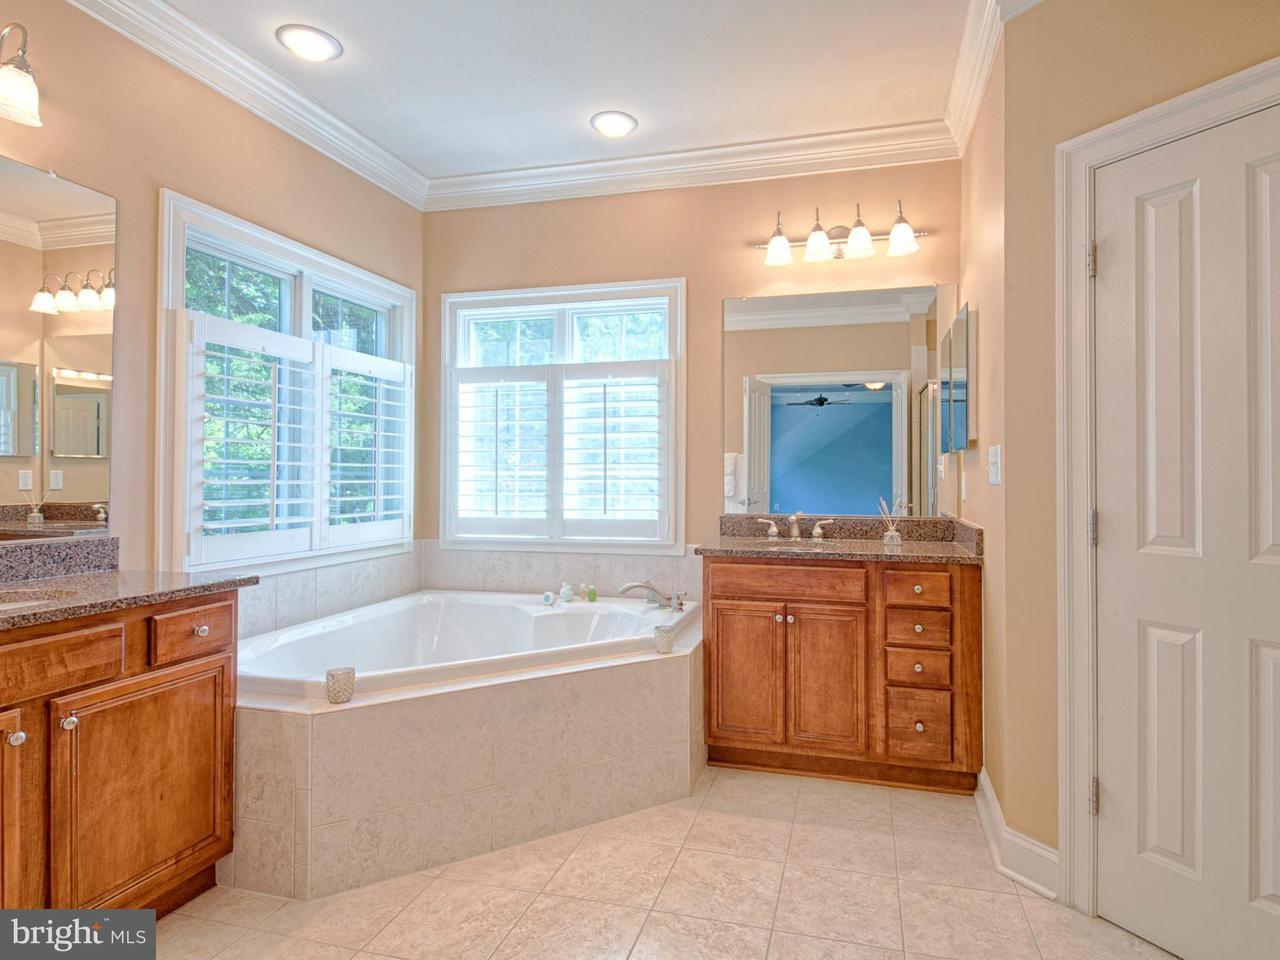 Additional photo for property listing at 10508 Center Street 10508 Center Street Fairfax, Virginia 22030 Stati Uniti